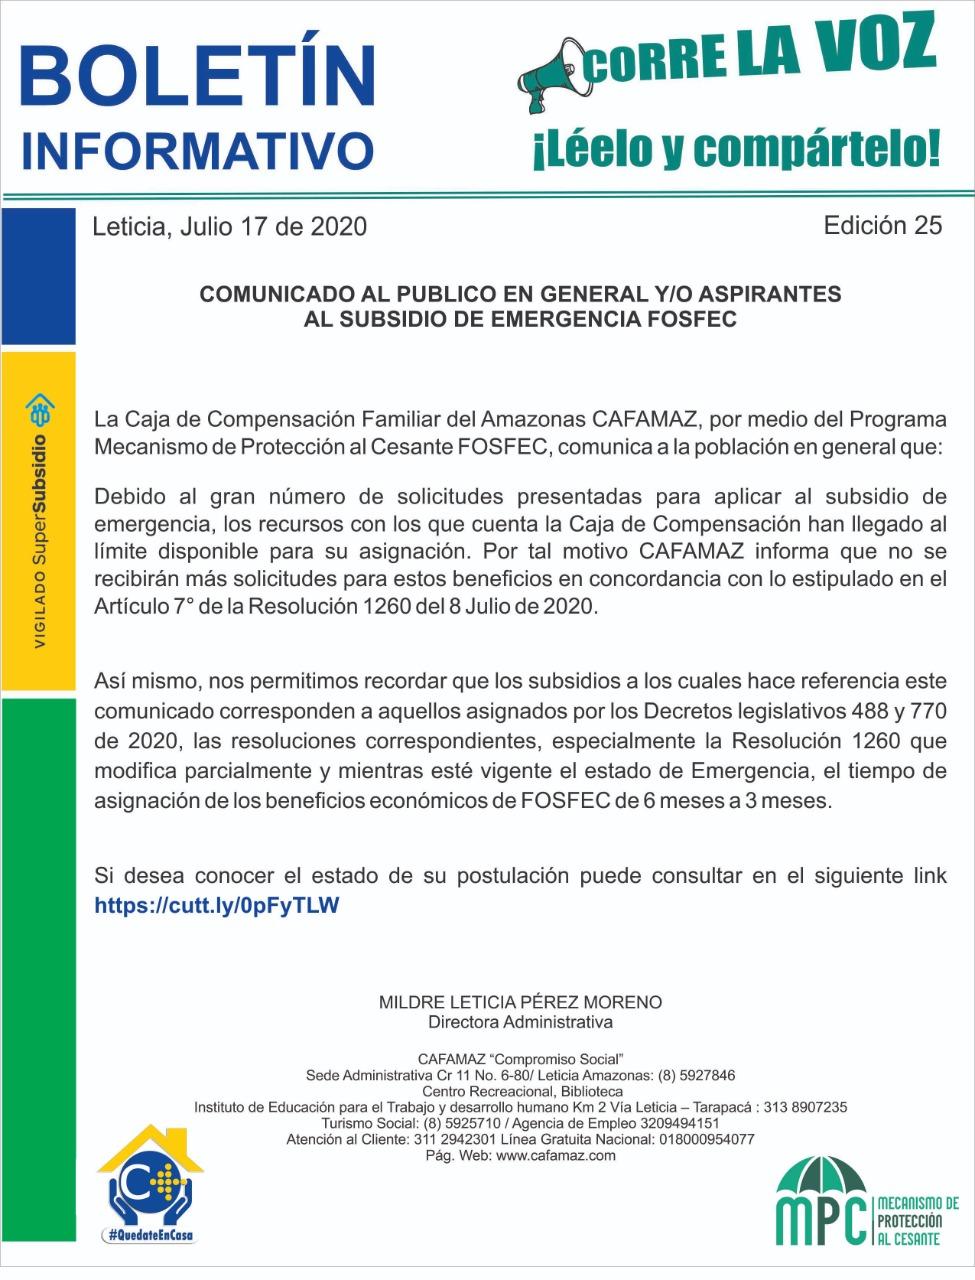 Boletín Informativo Edición 25 | Cafamaz, 2020